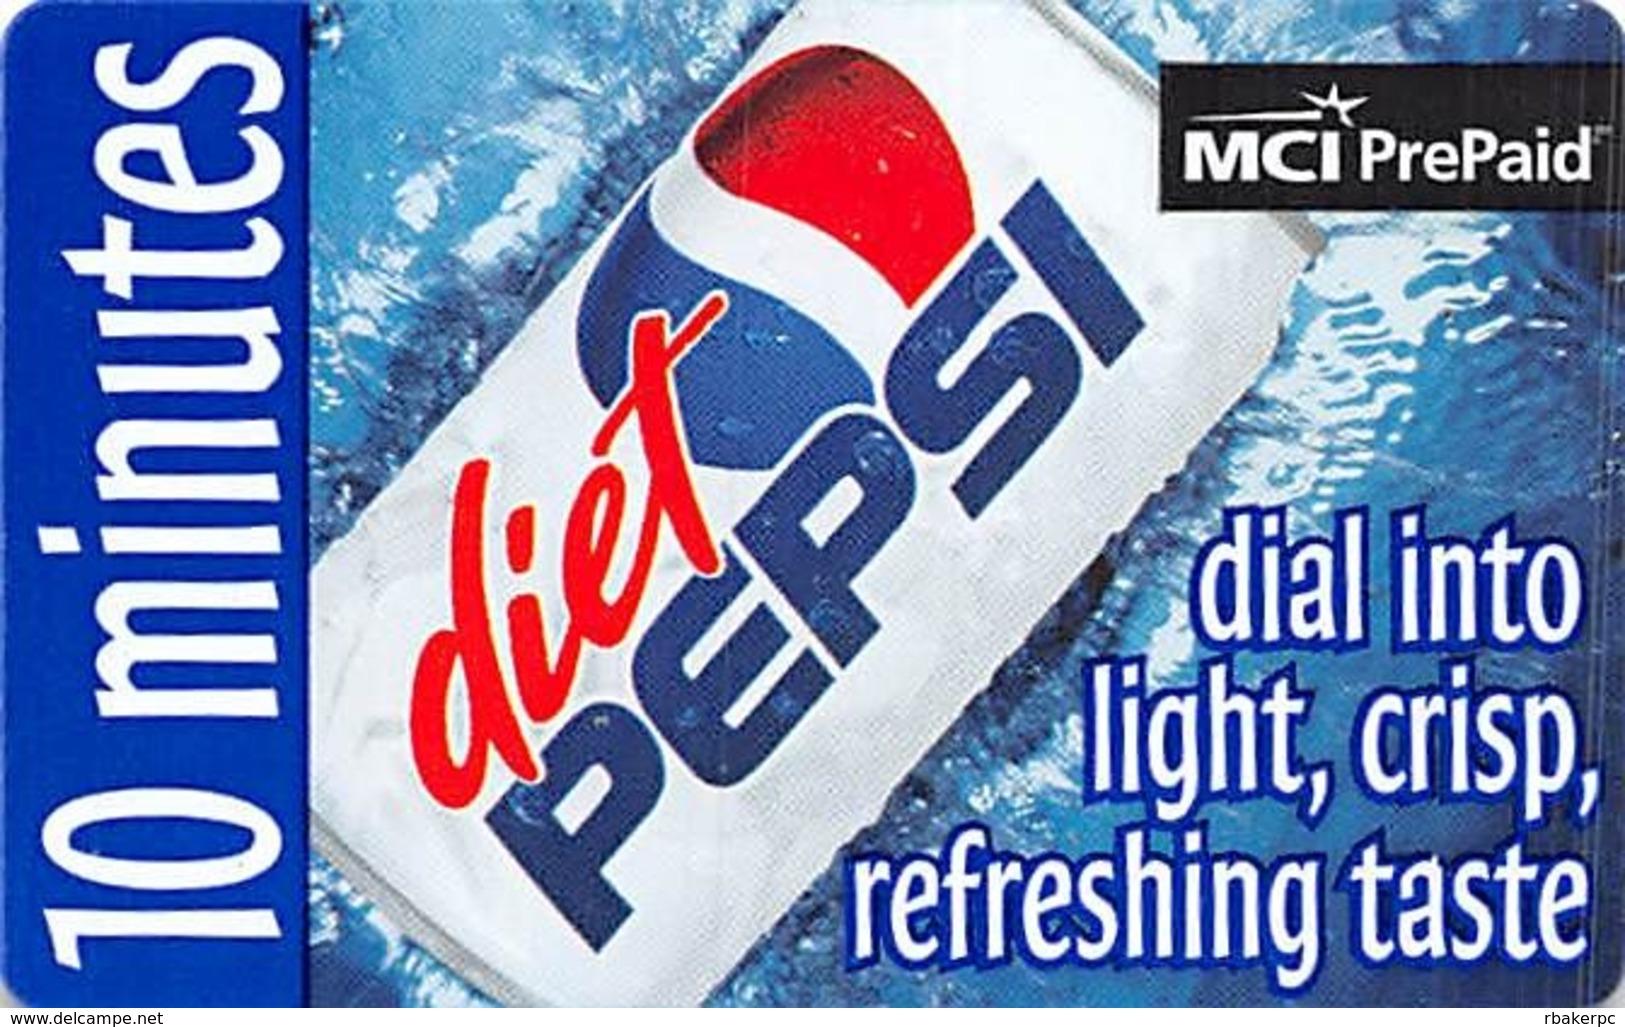 Diet Pepsi / MCI PrePaid Phone Card 10 Minutes - Advertising